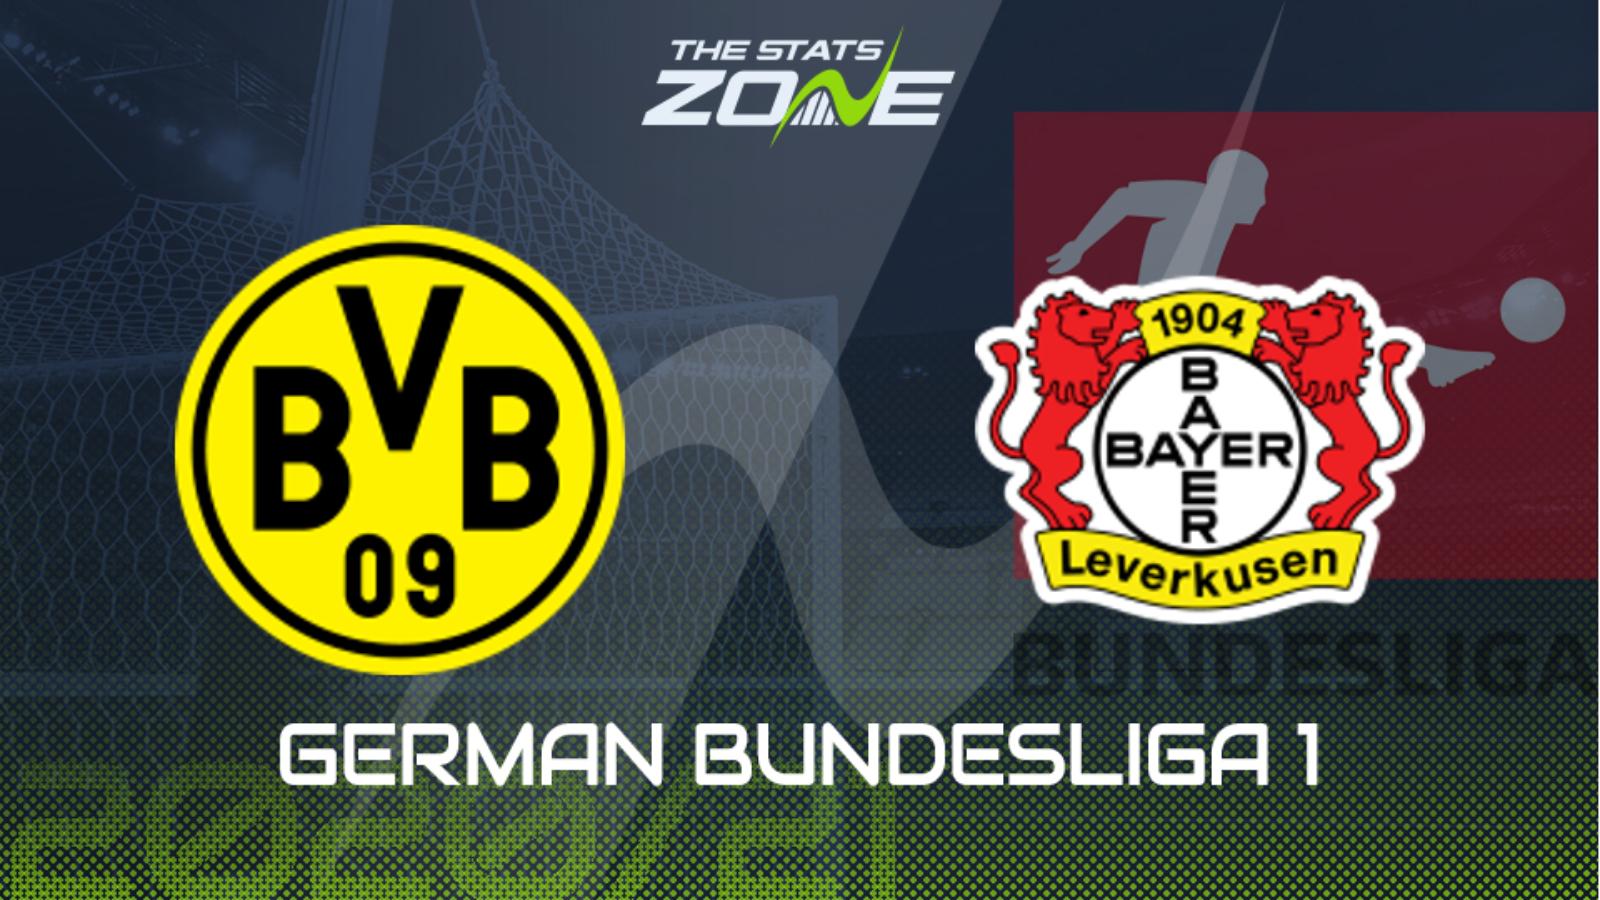 2020 21 German Bundesliga Borussia Dortmund Vs Bayer Leverkusen Preview Prediction The Stats Zone